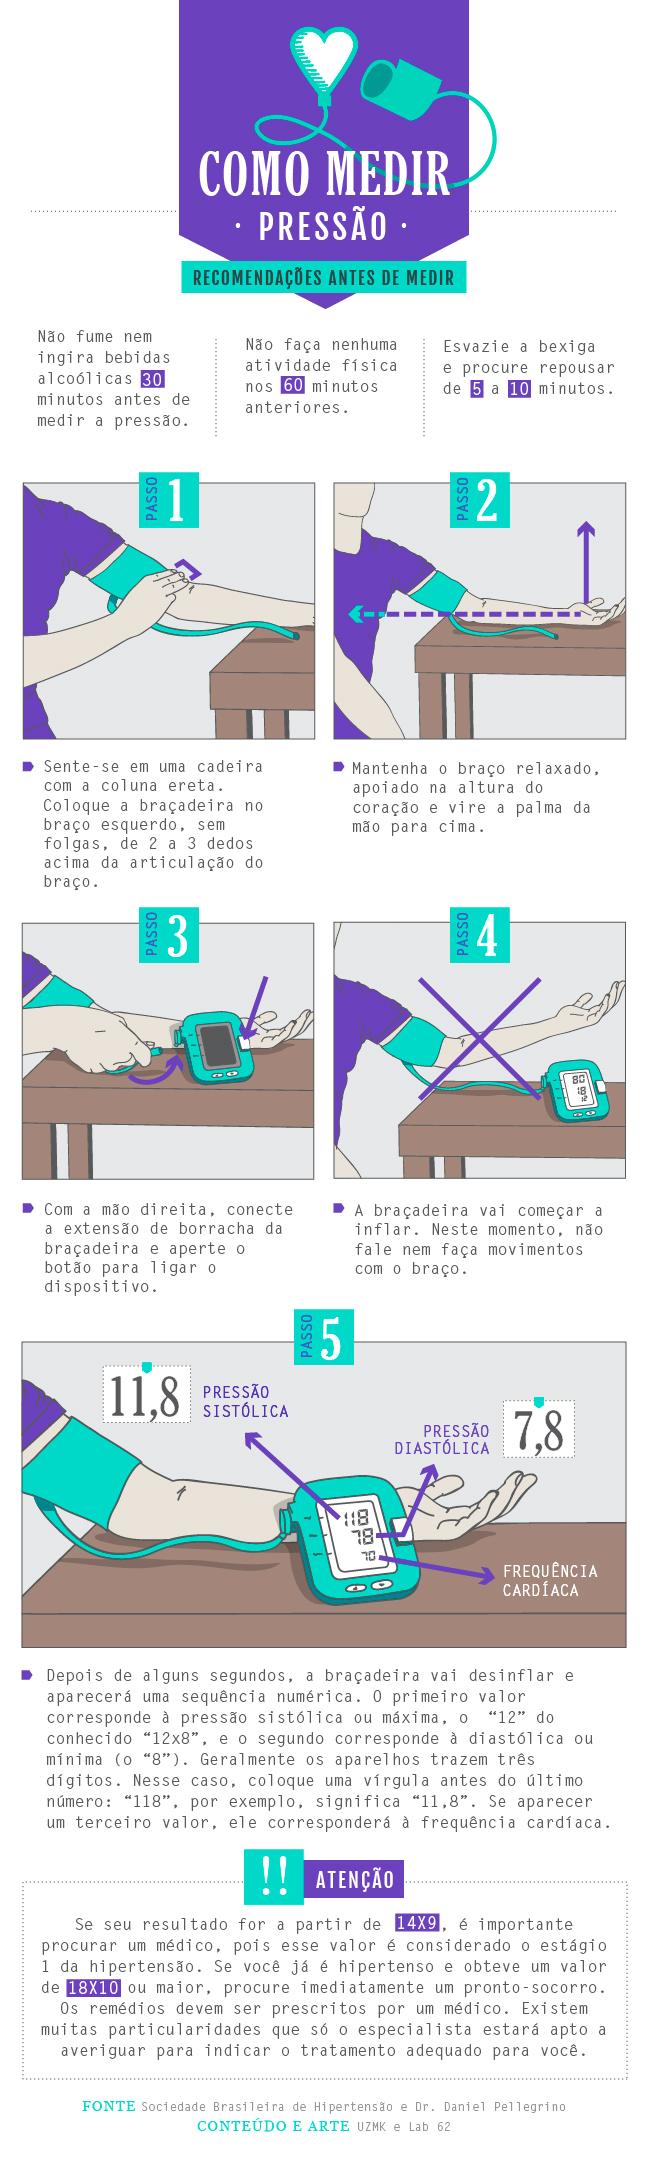 info_medirPressao